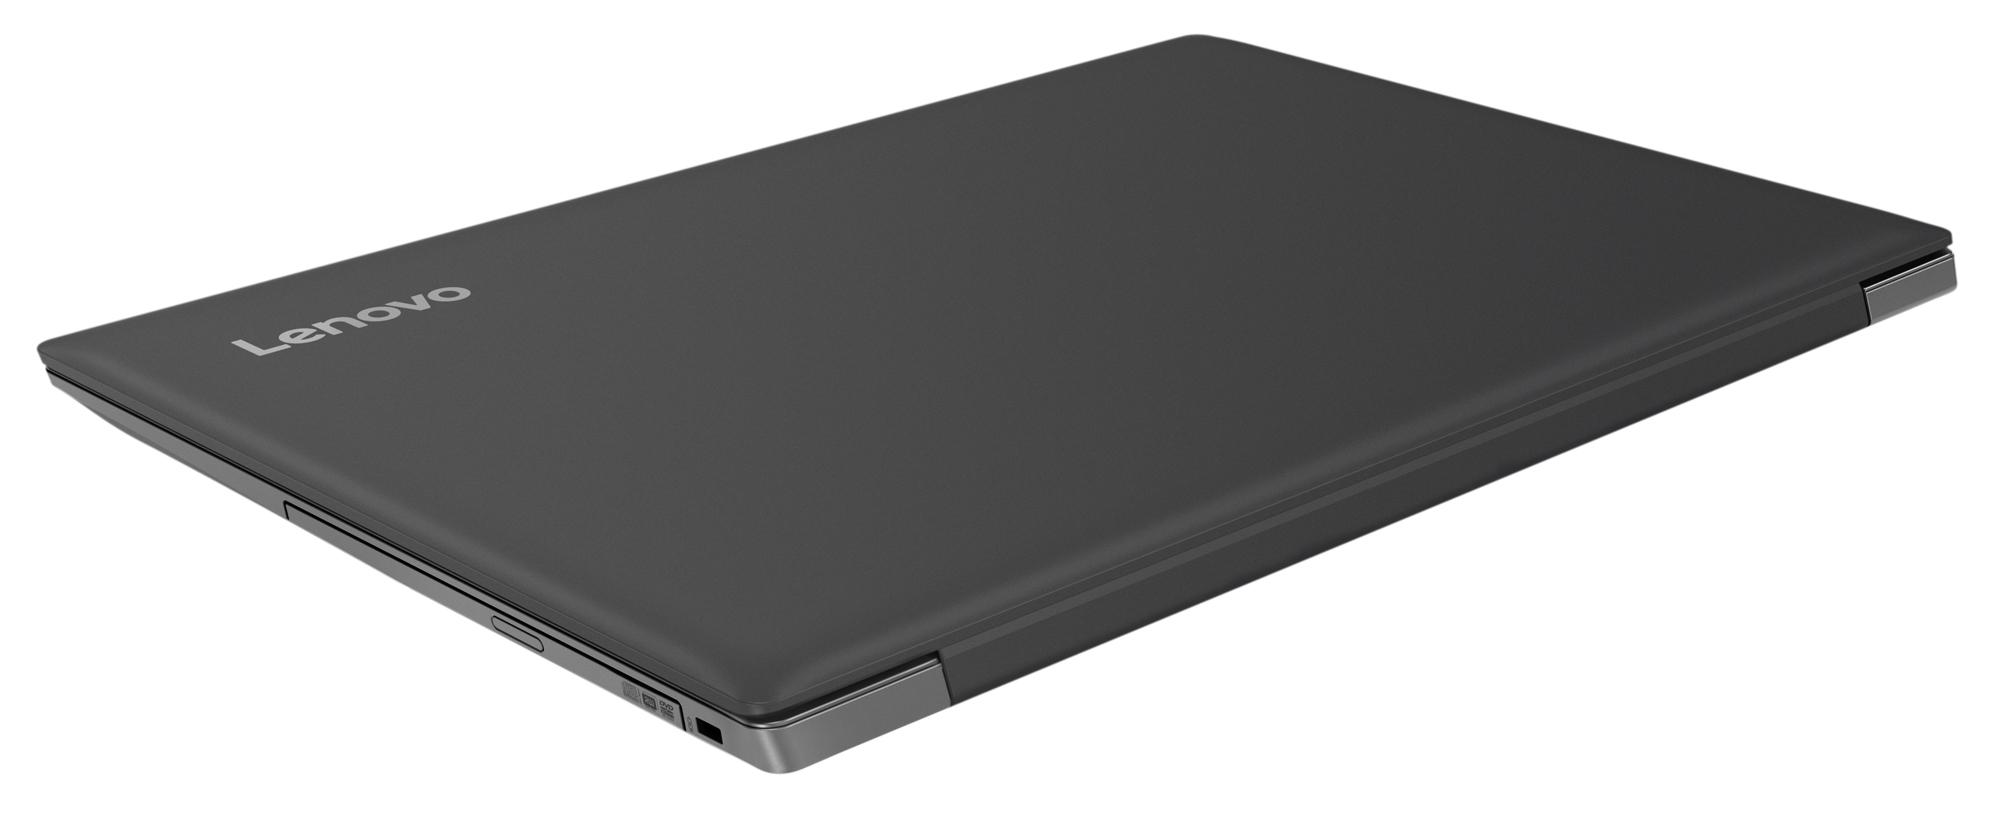 Фото  Ноутбук Lenovo ideapad 330-15 Onyx Black (81D2009SRA)